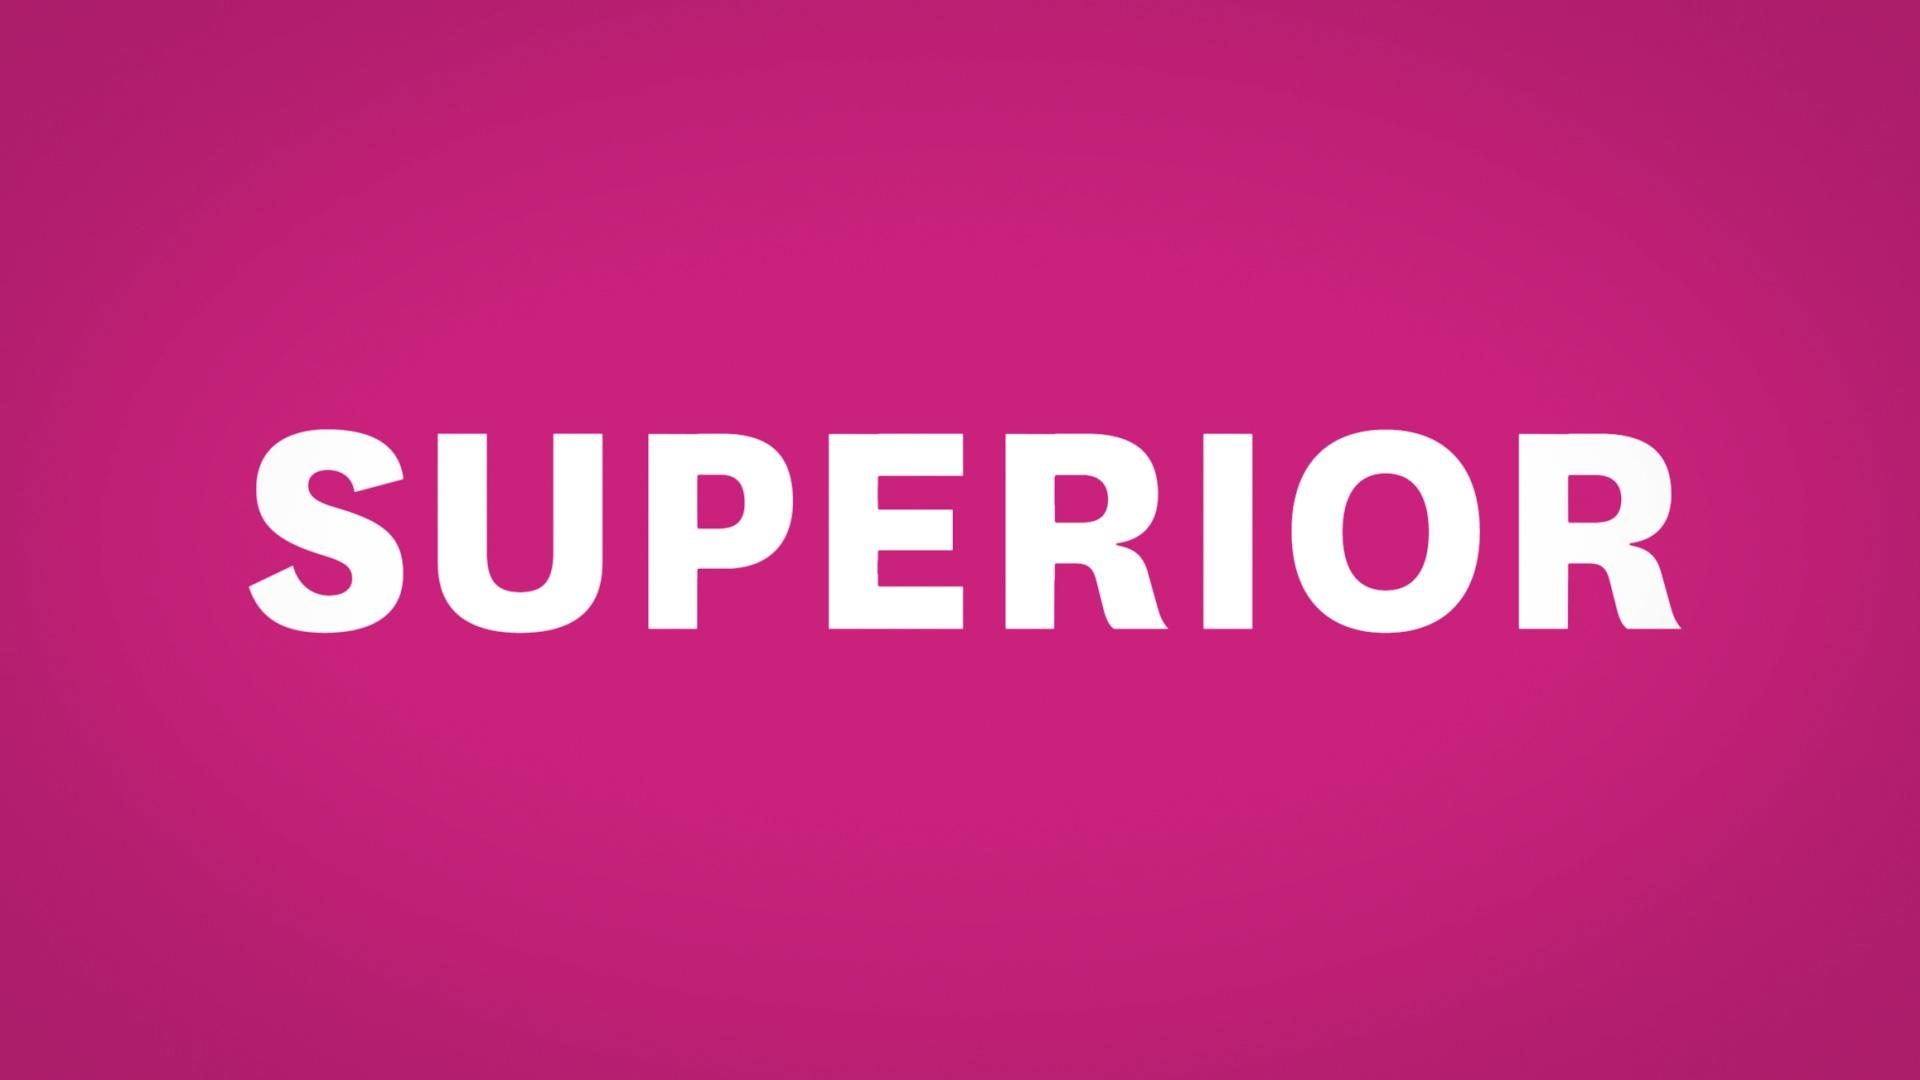 SuperiorHealth-02-06.jpg